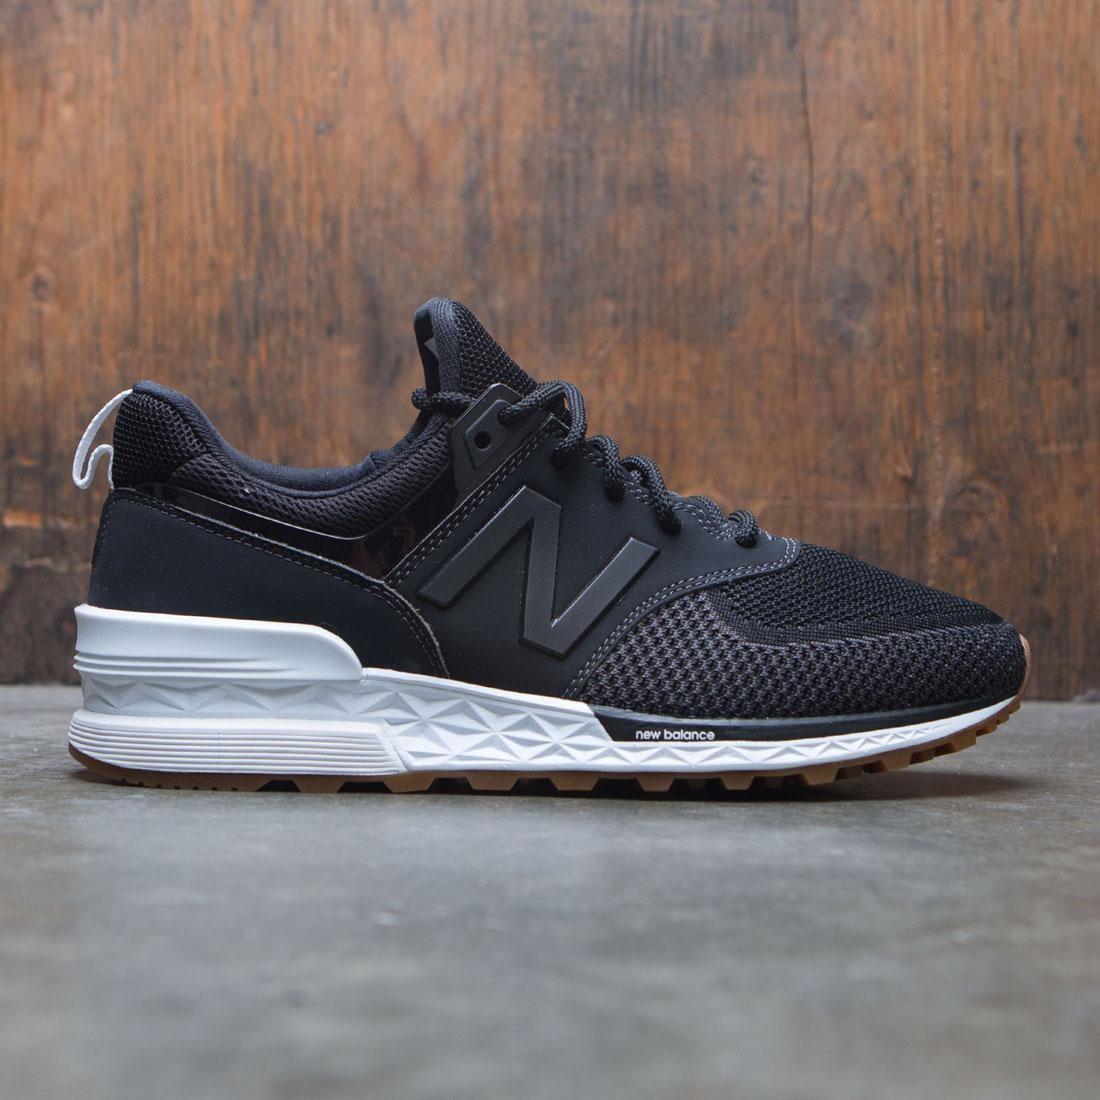 New Balance 574 Sport Shoes